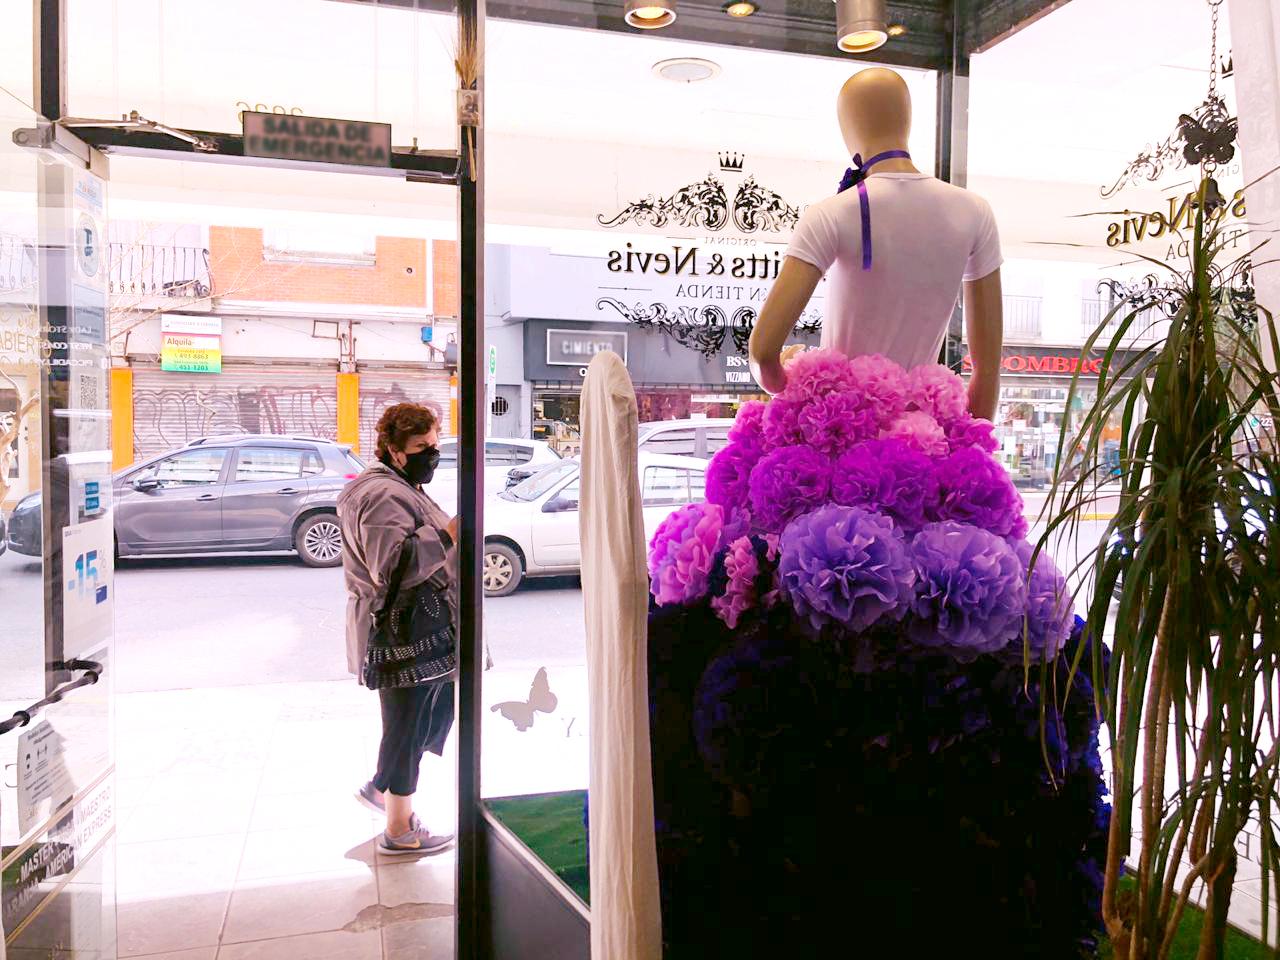 Calle Rivadavia: montaron un maniquí con falda de rosas y regalan flores